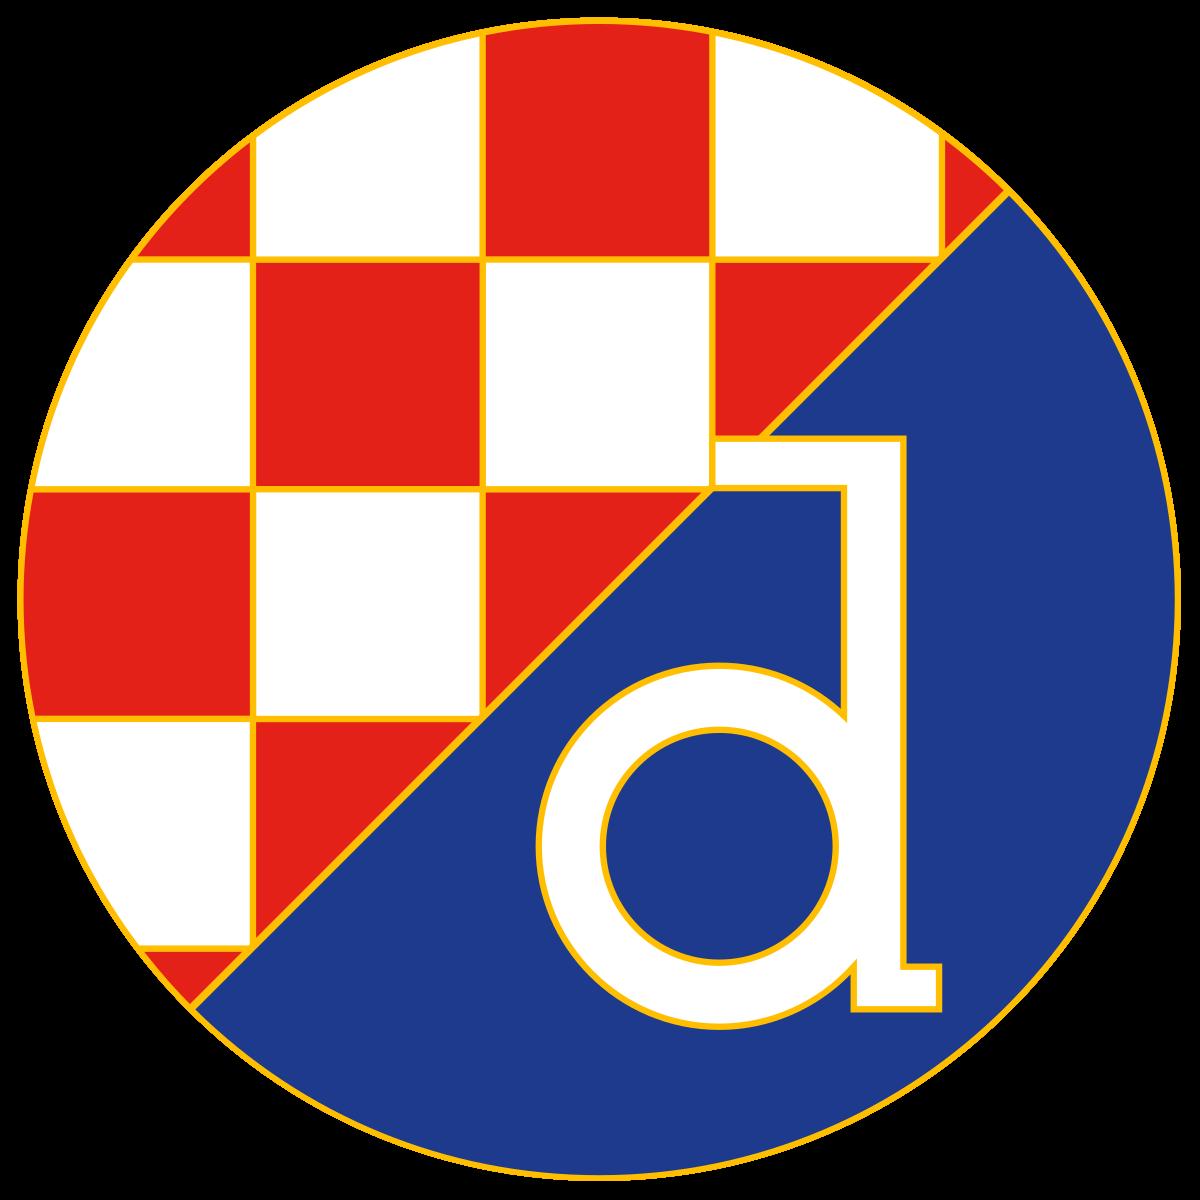 Dinamo Zagreb Logo 2019 20 Uefa Champions League Gnk Dinamo Zagreb Zagreb Champions League